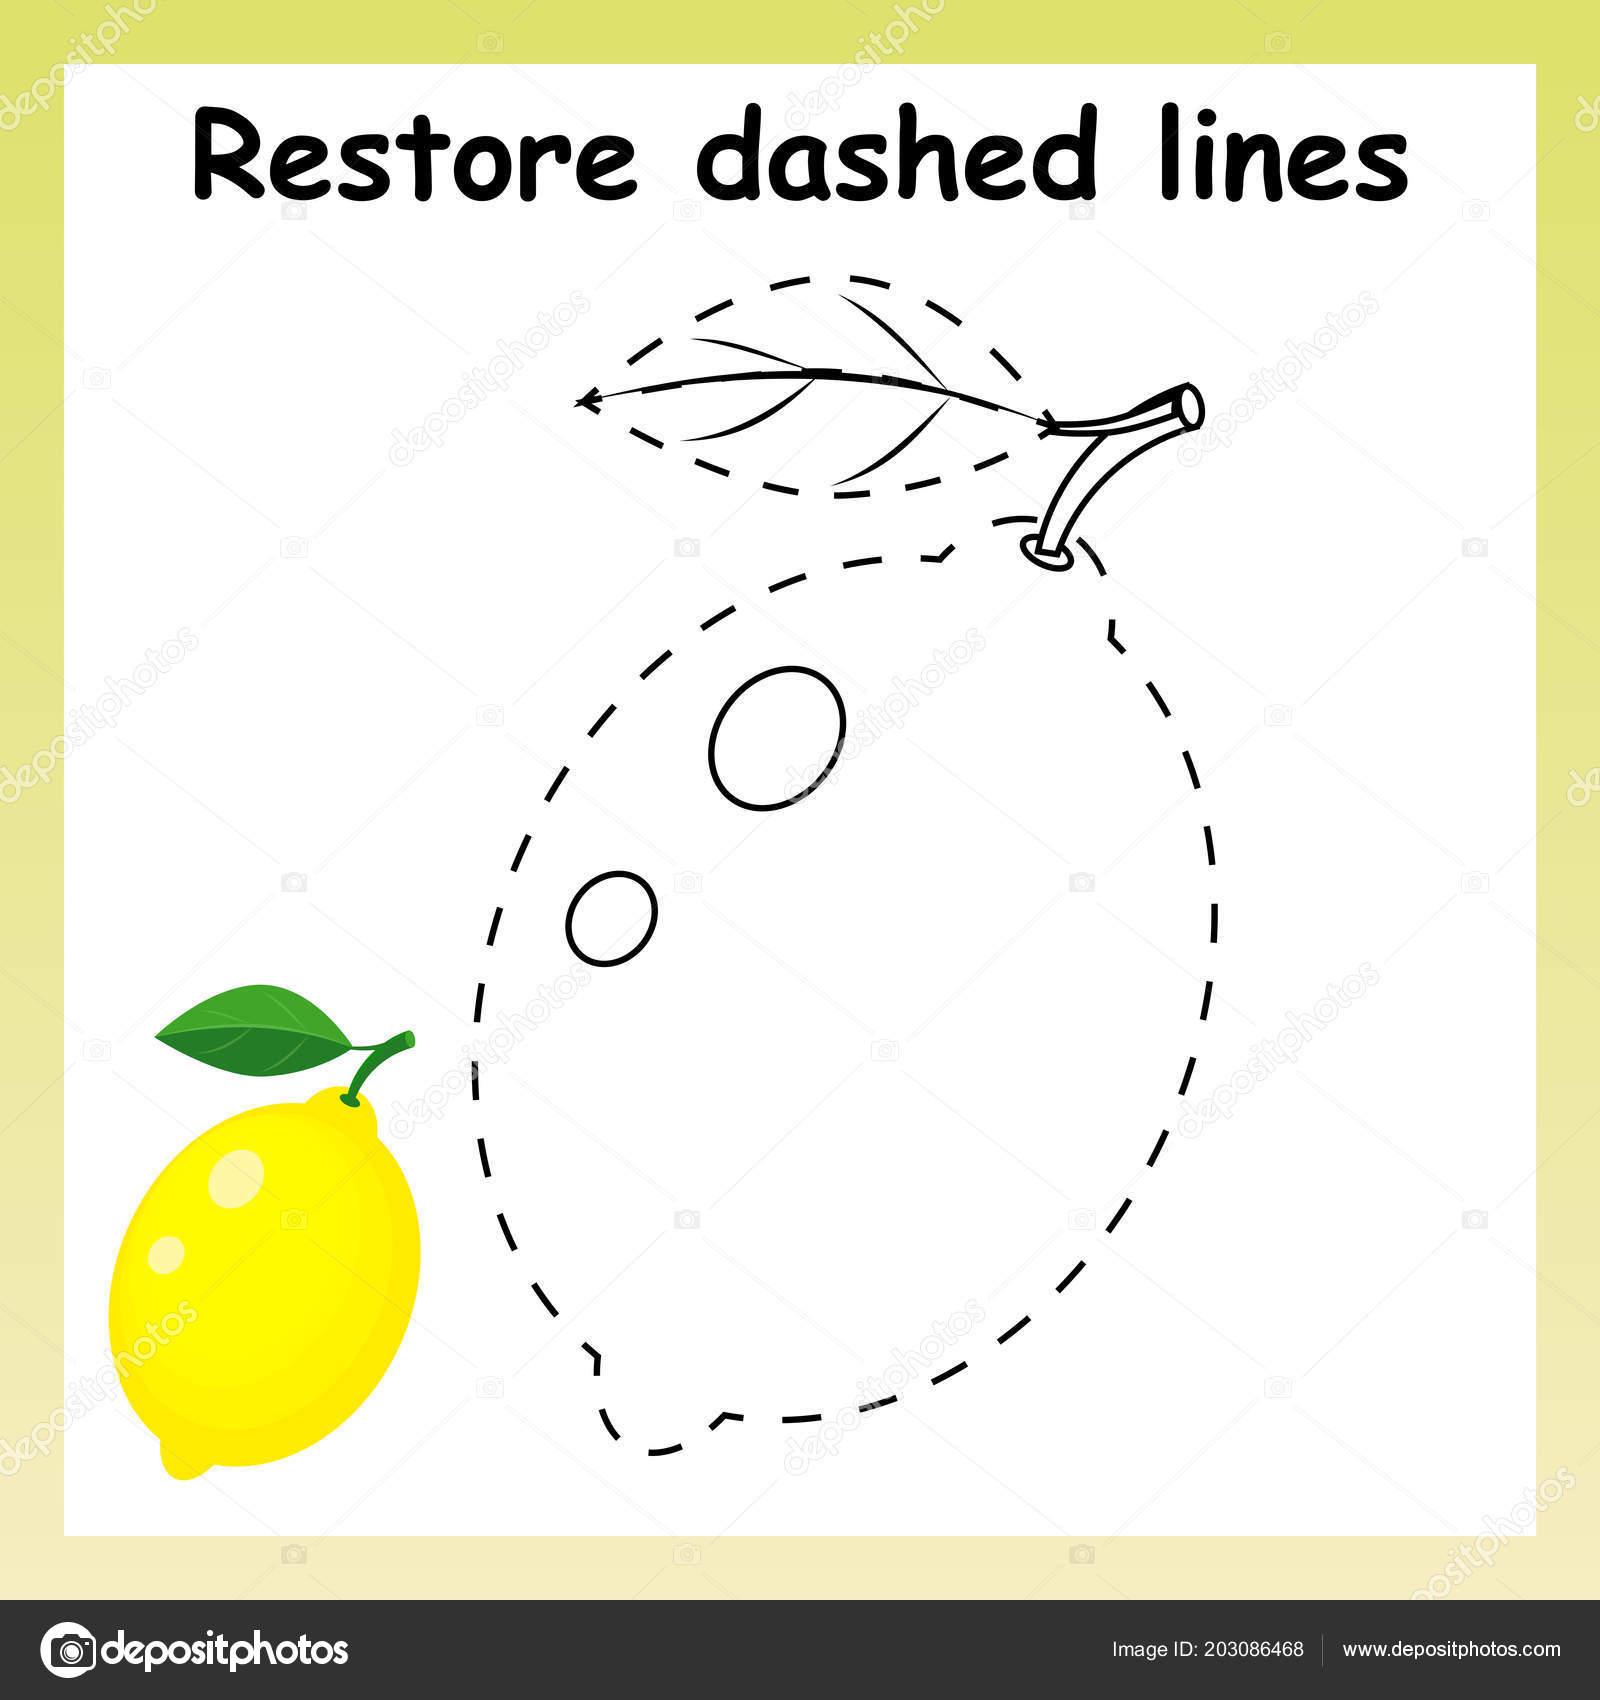 Trace Game For Children Cartoon Yellow Lemon Restore